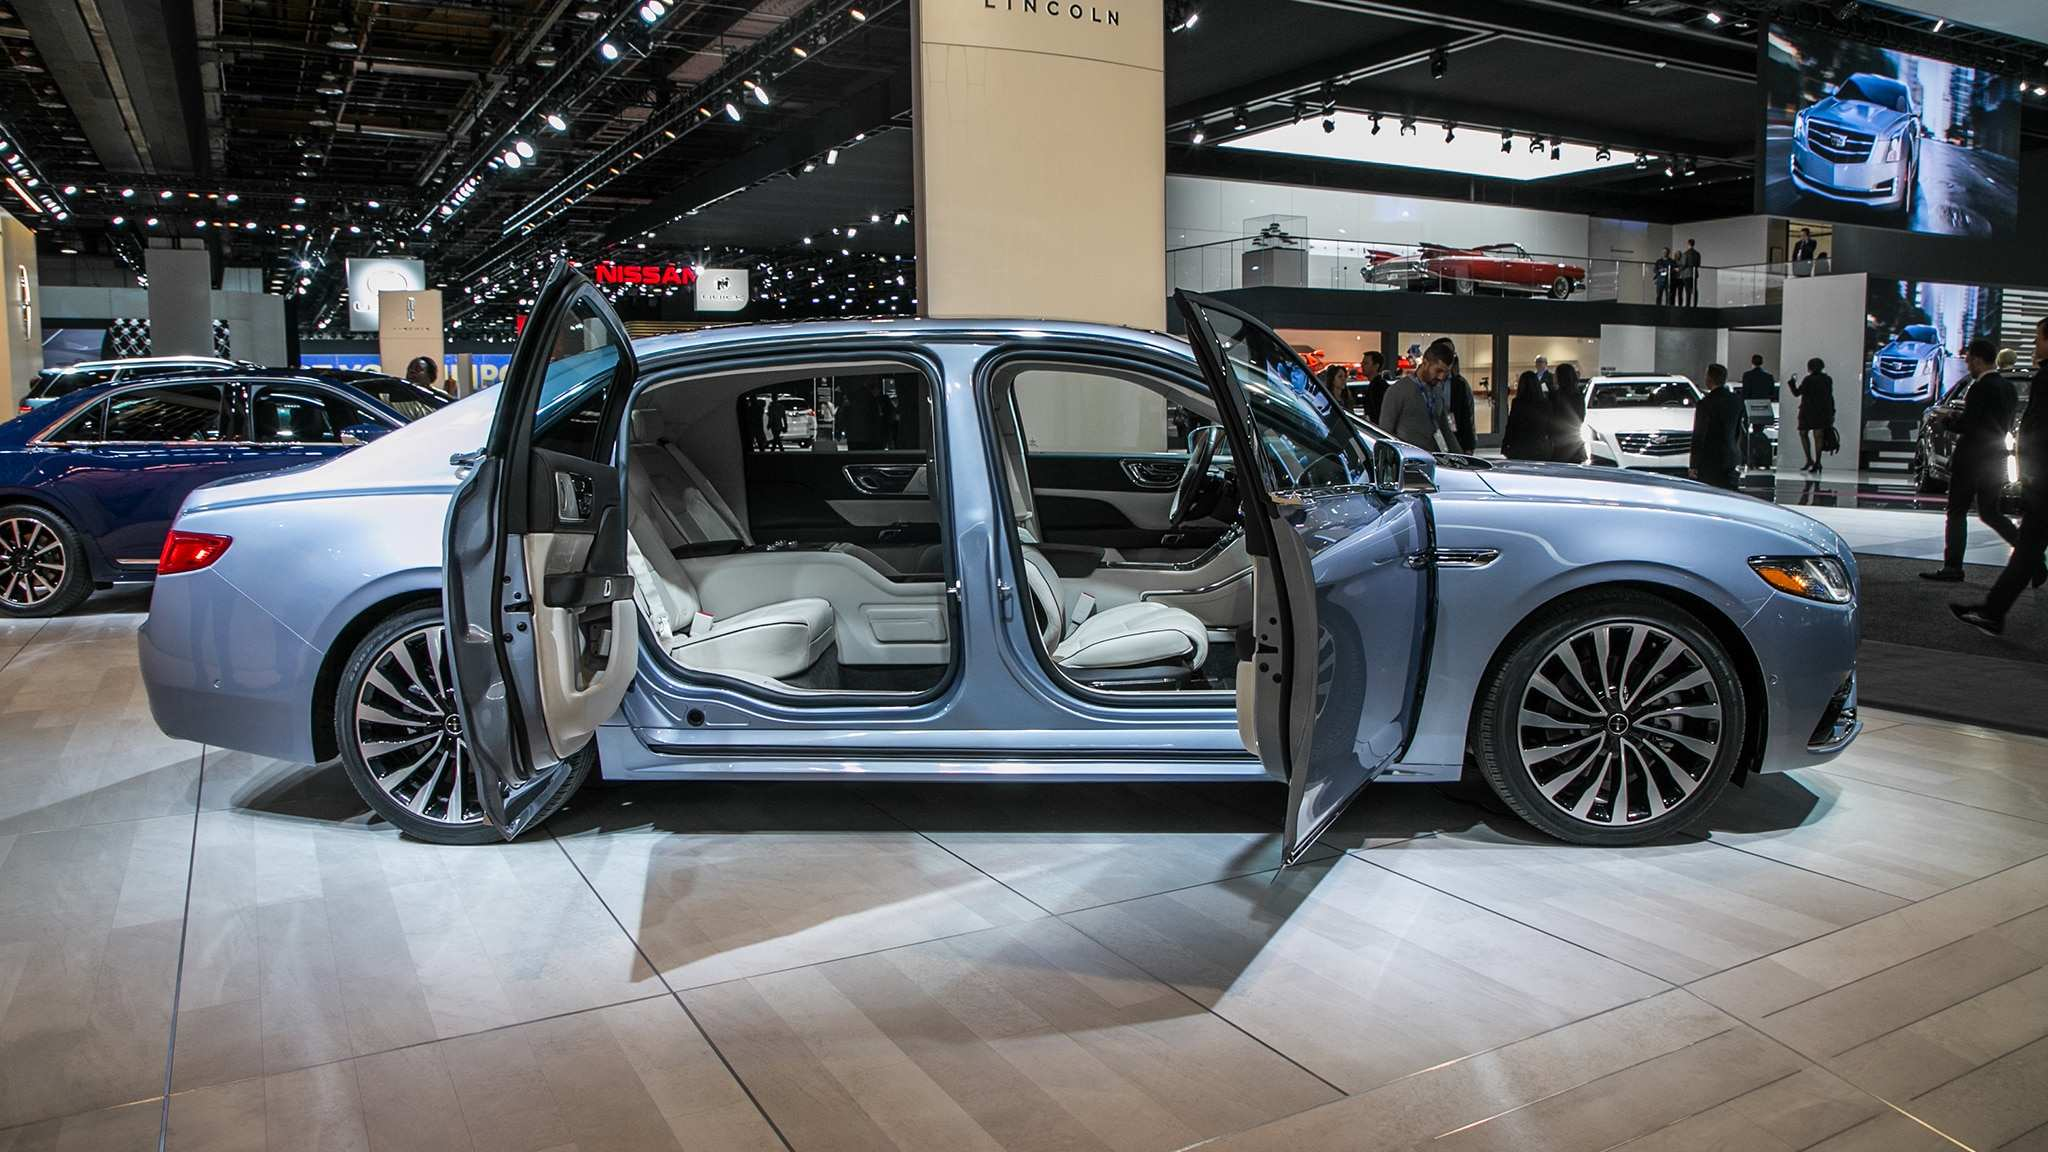 28 The 2019 Lincoln Town Car Rumors by 2019 Lincoln Town Car